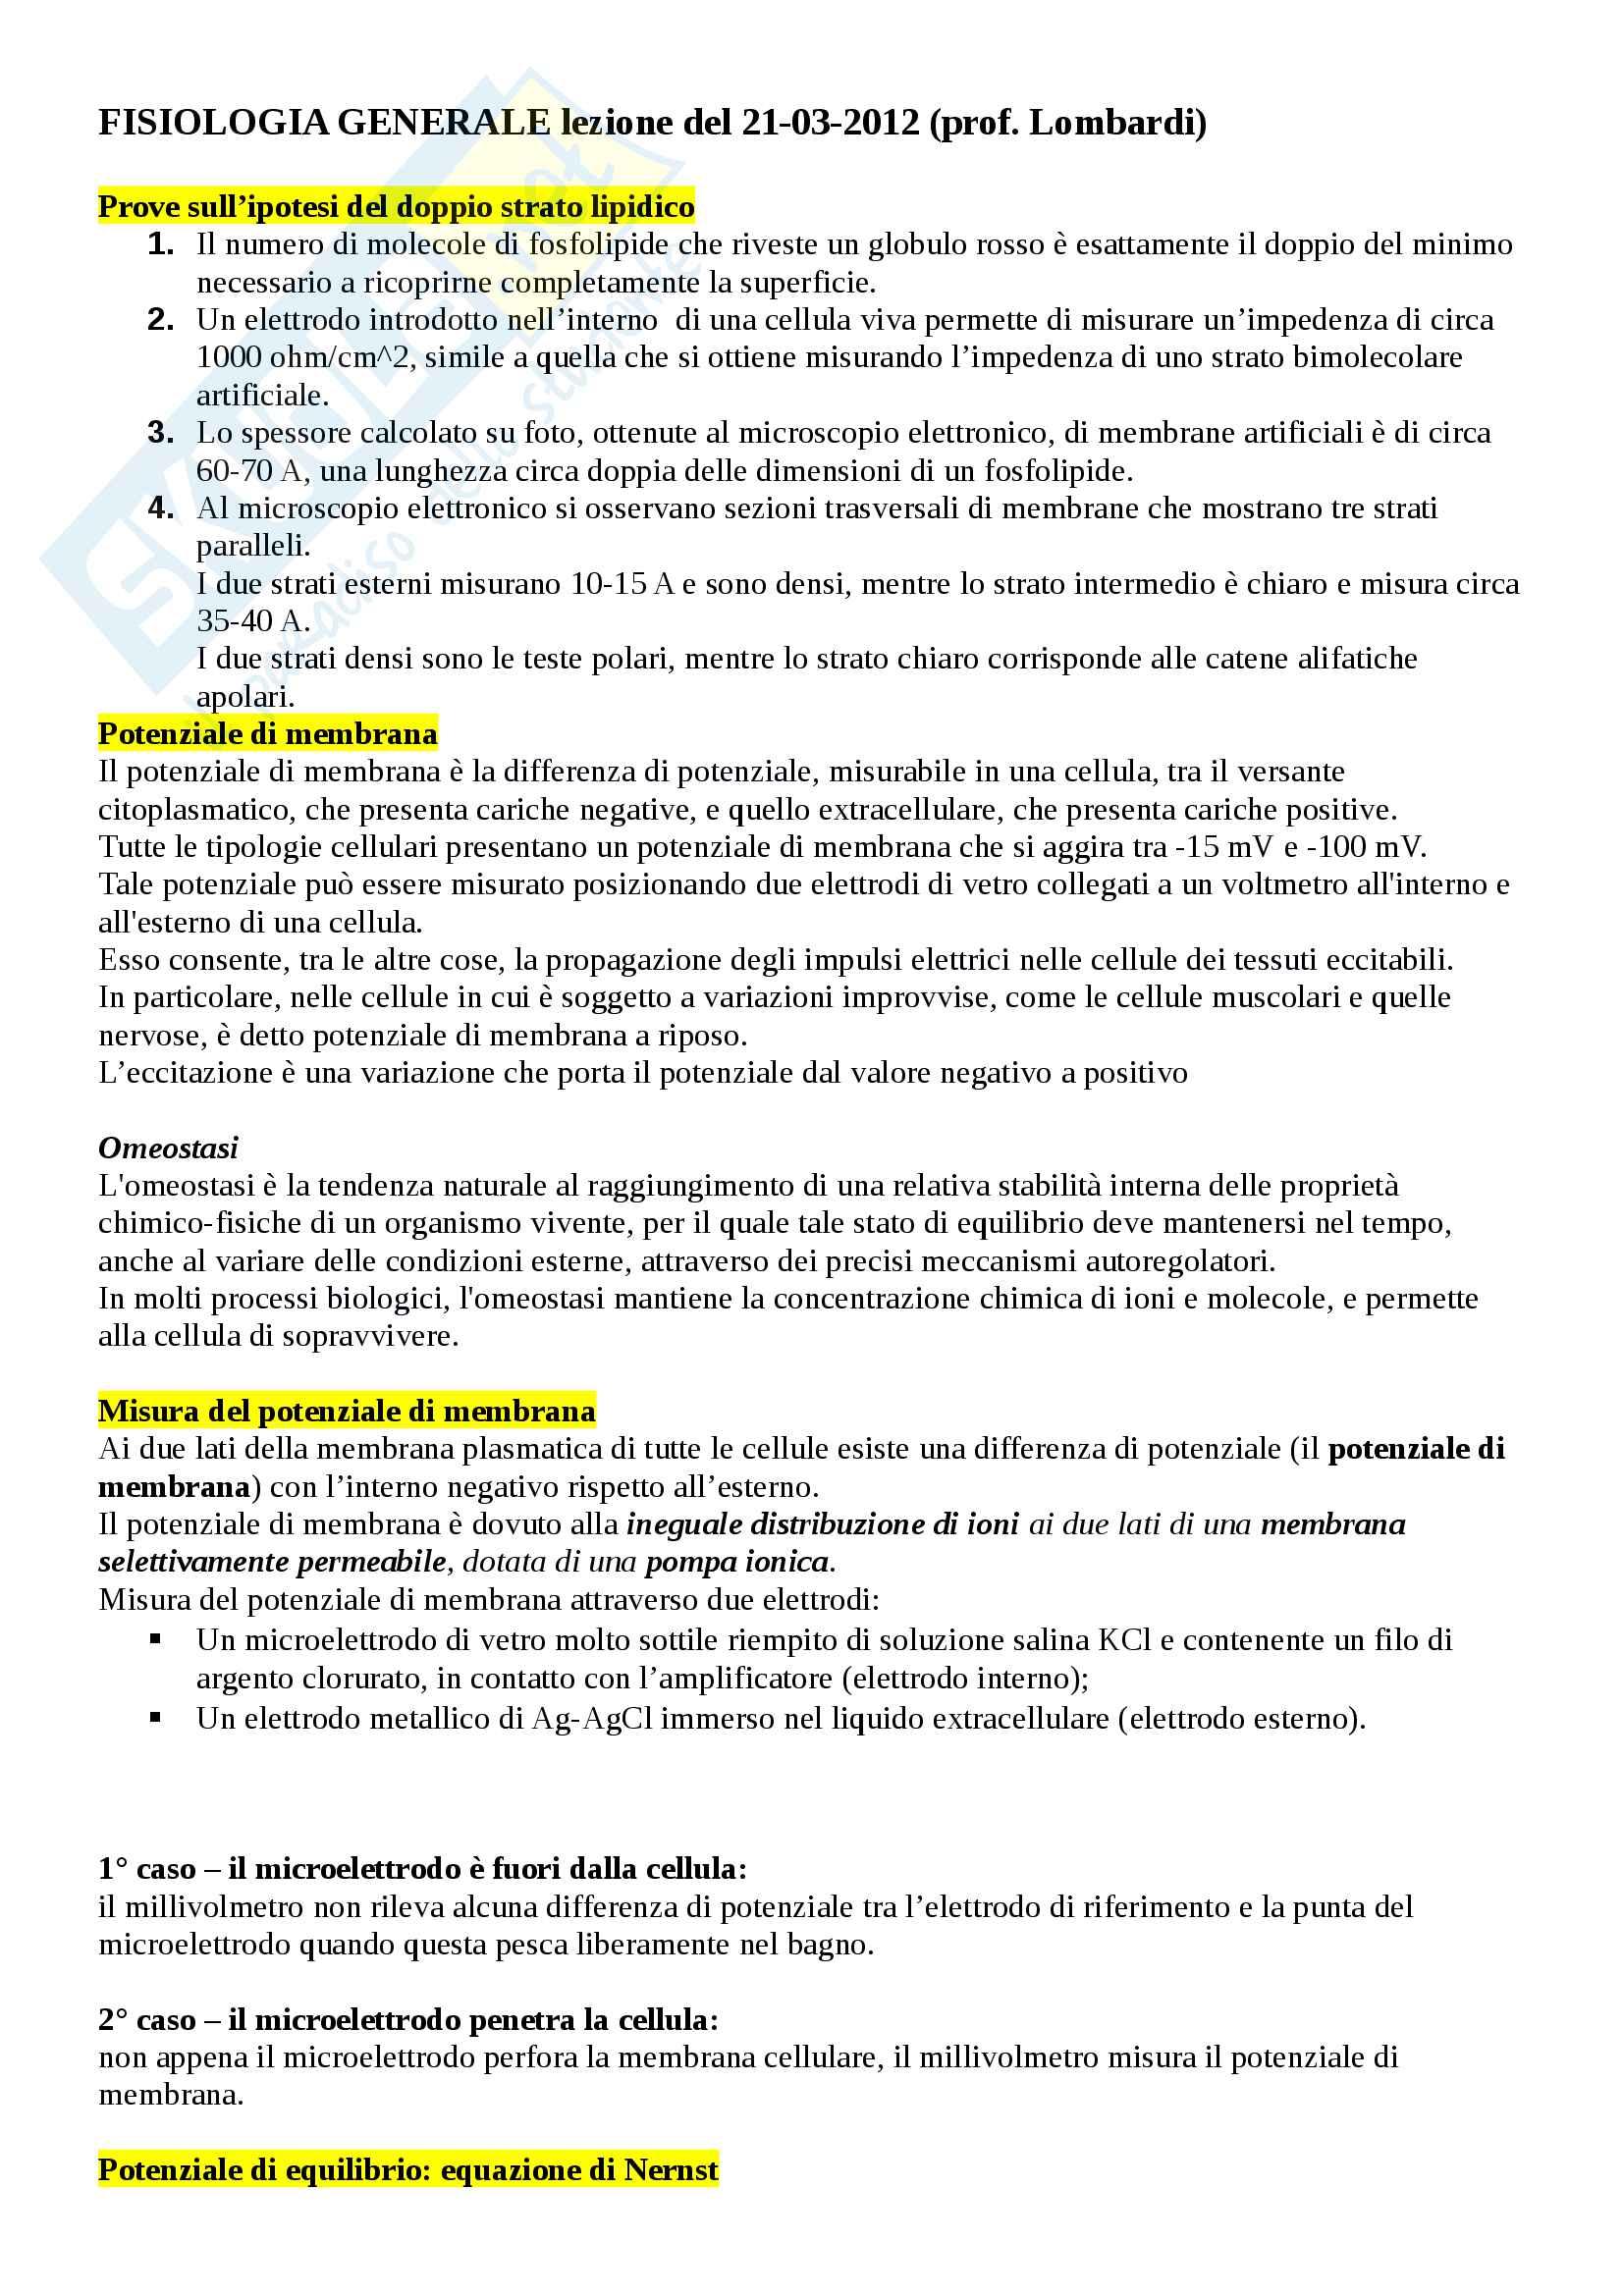 Fisiologia generale, lezione 02